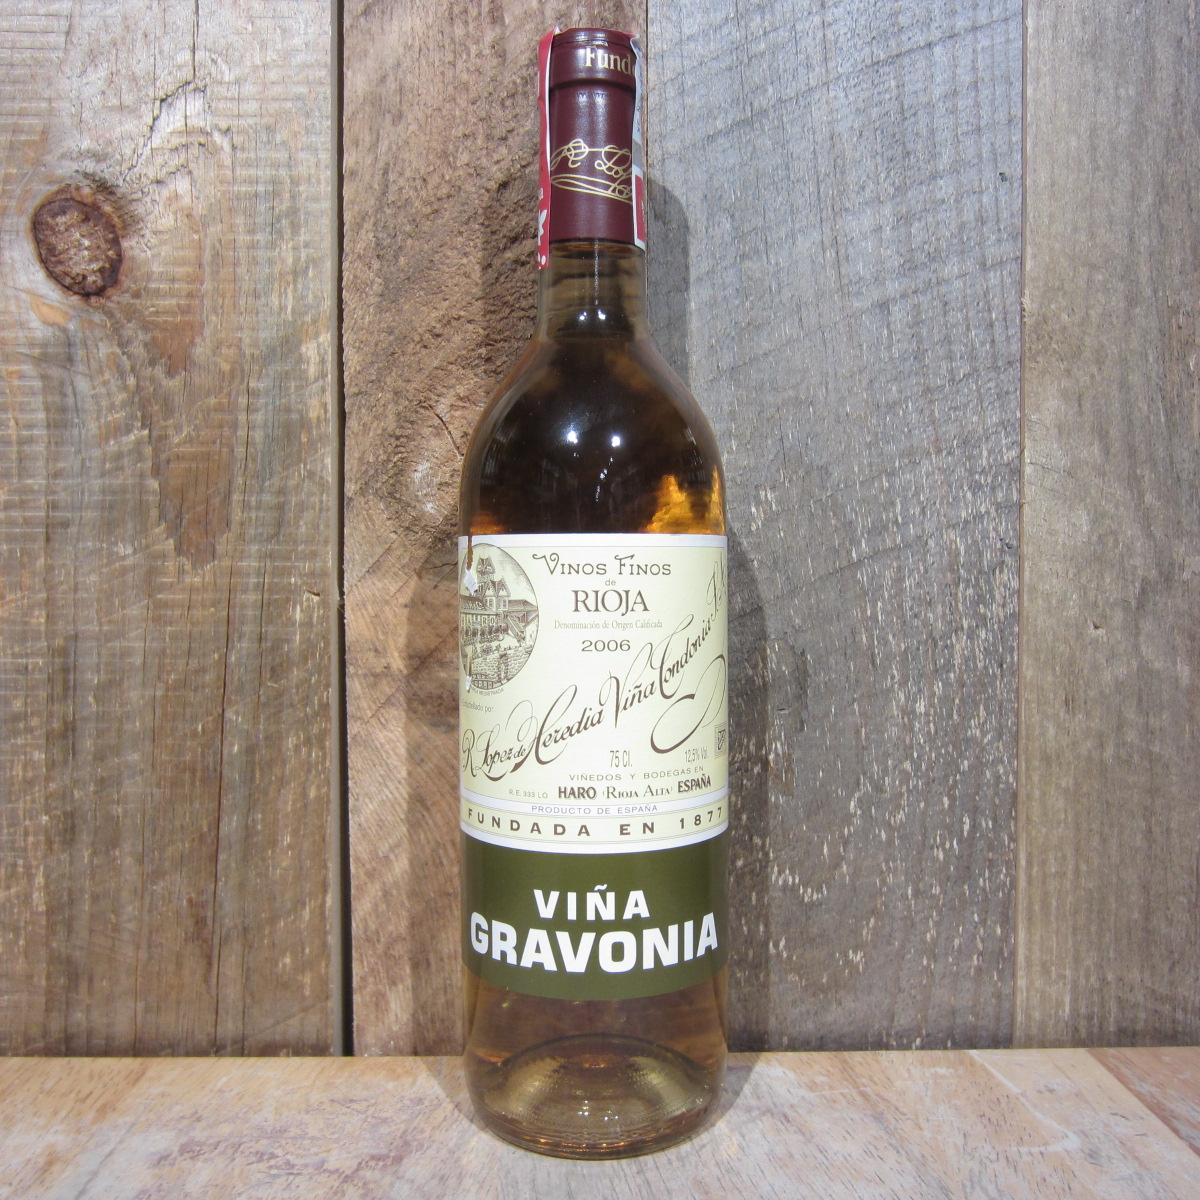 Lopez de Heredia Vina Gravonia Crianza Rioja Blanco 2012 750ml